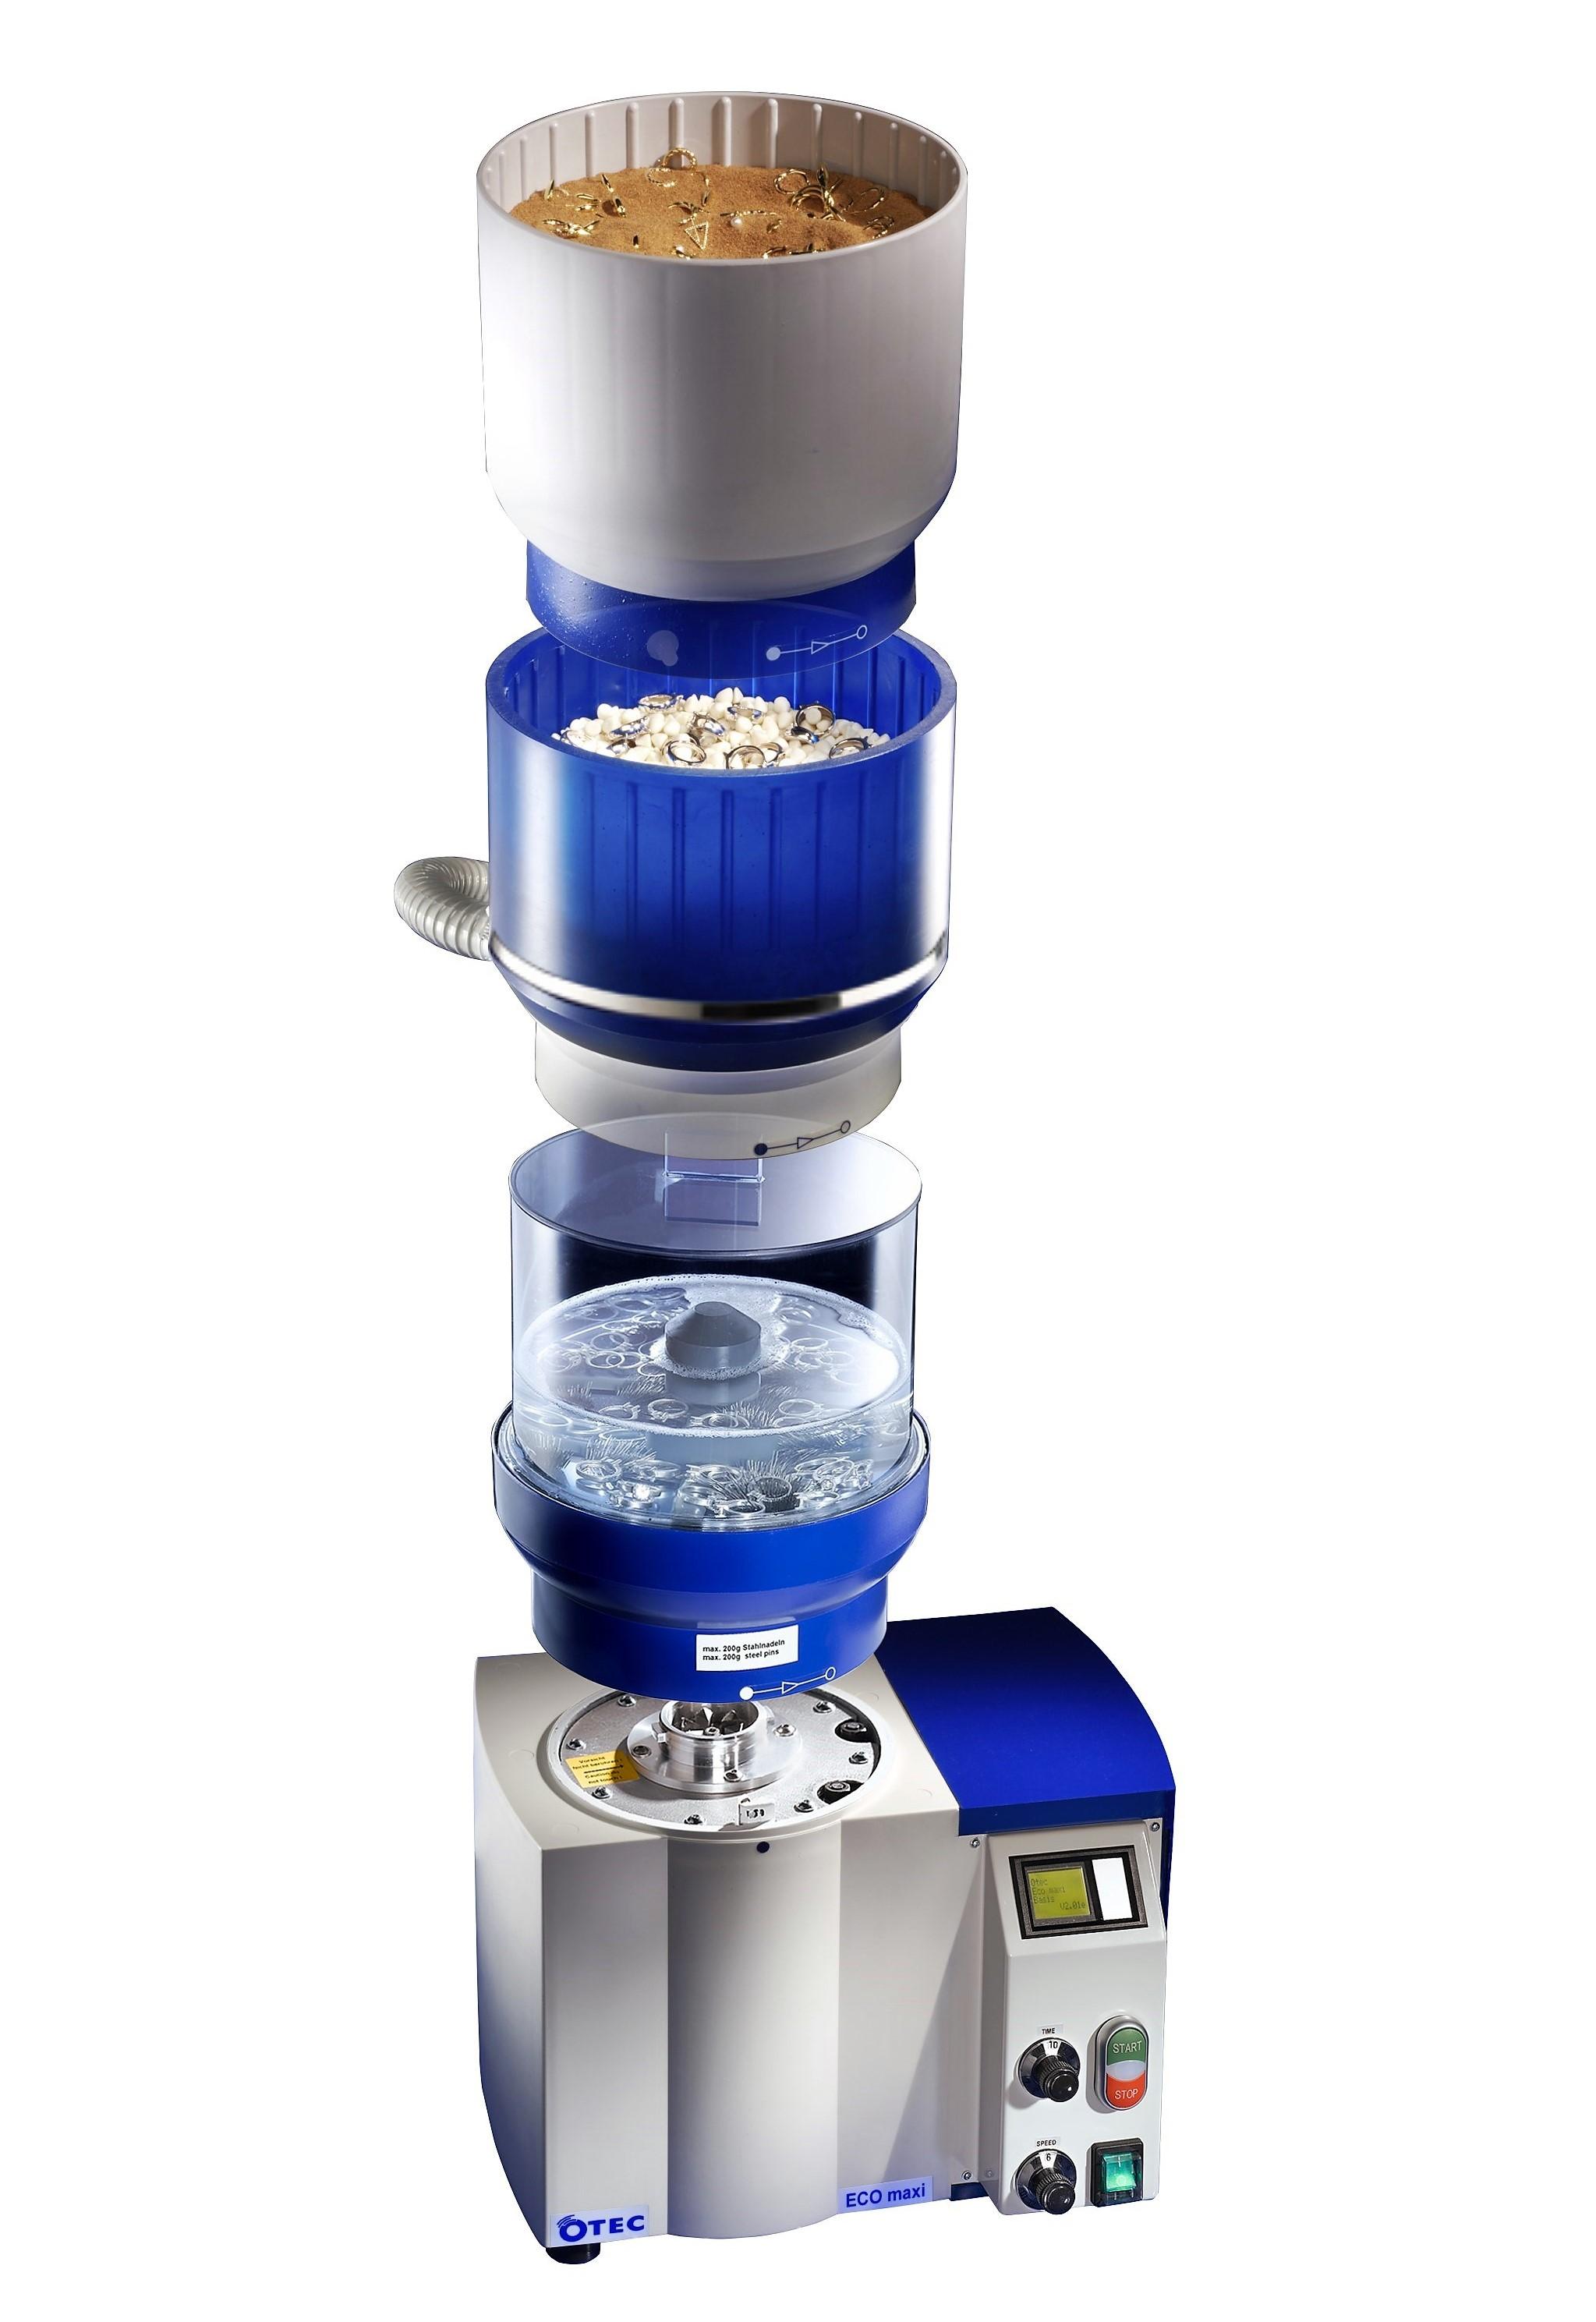 OTEC ECO-Maxi machine